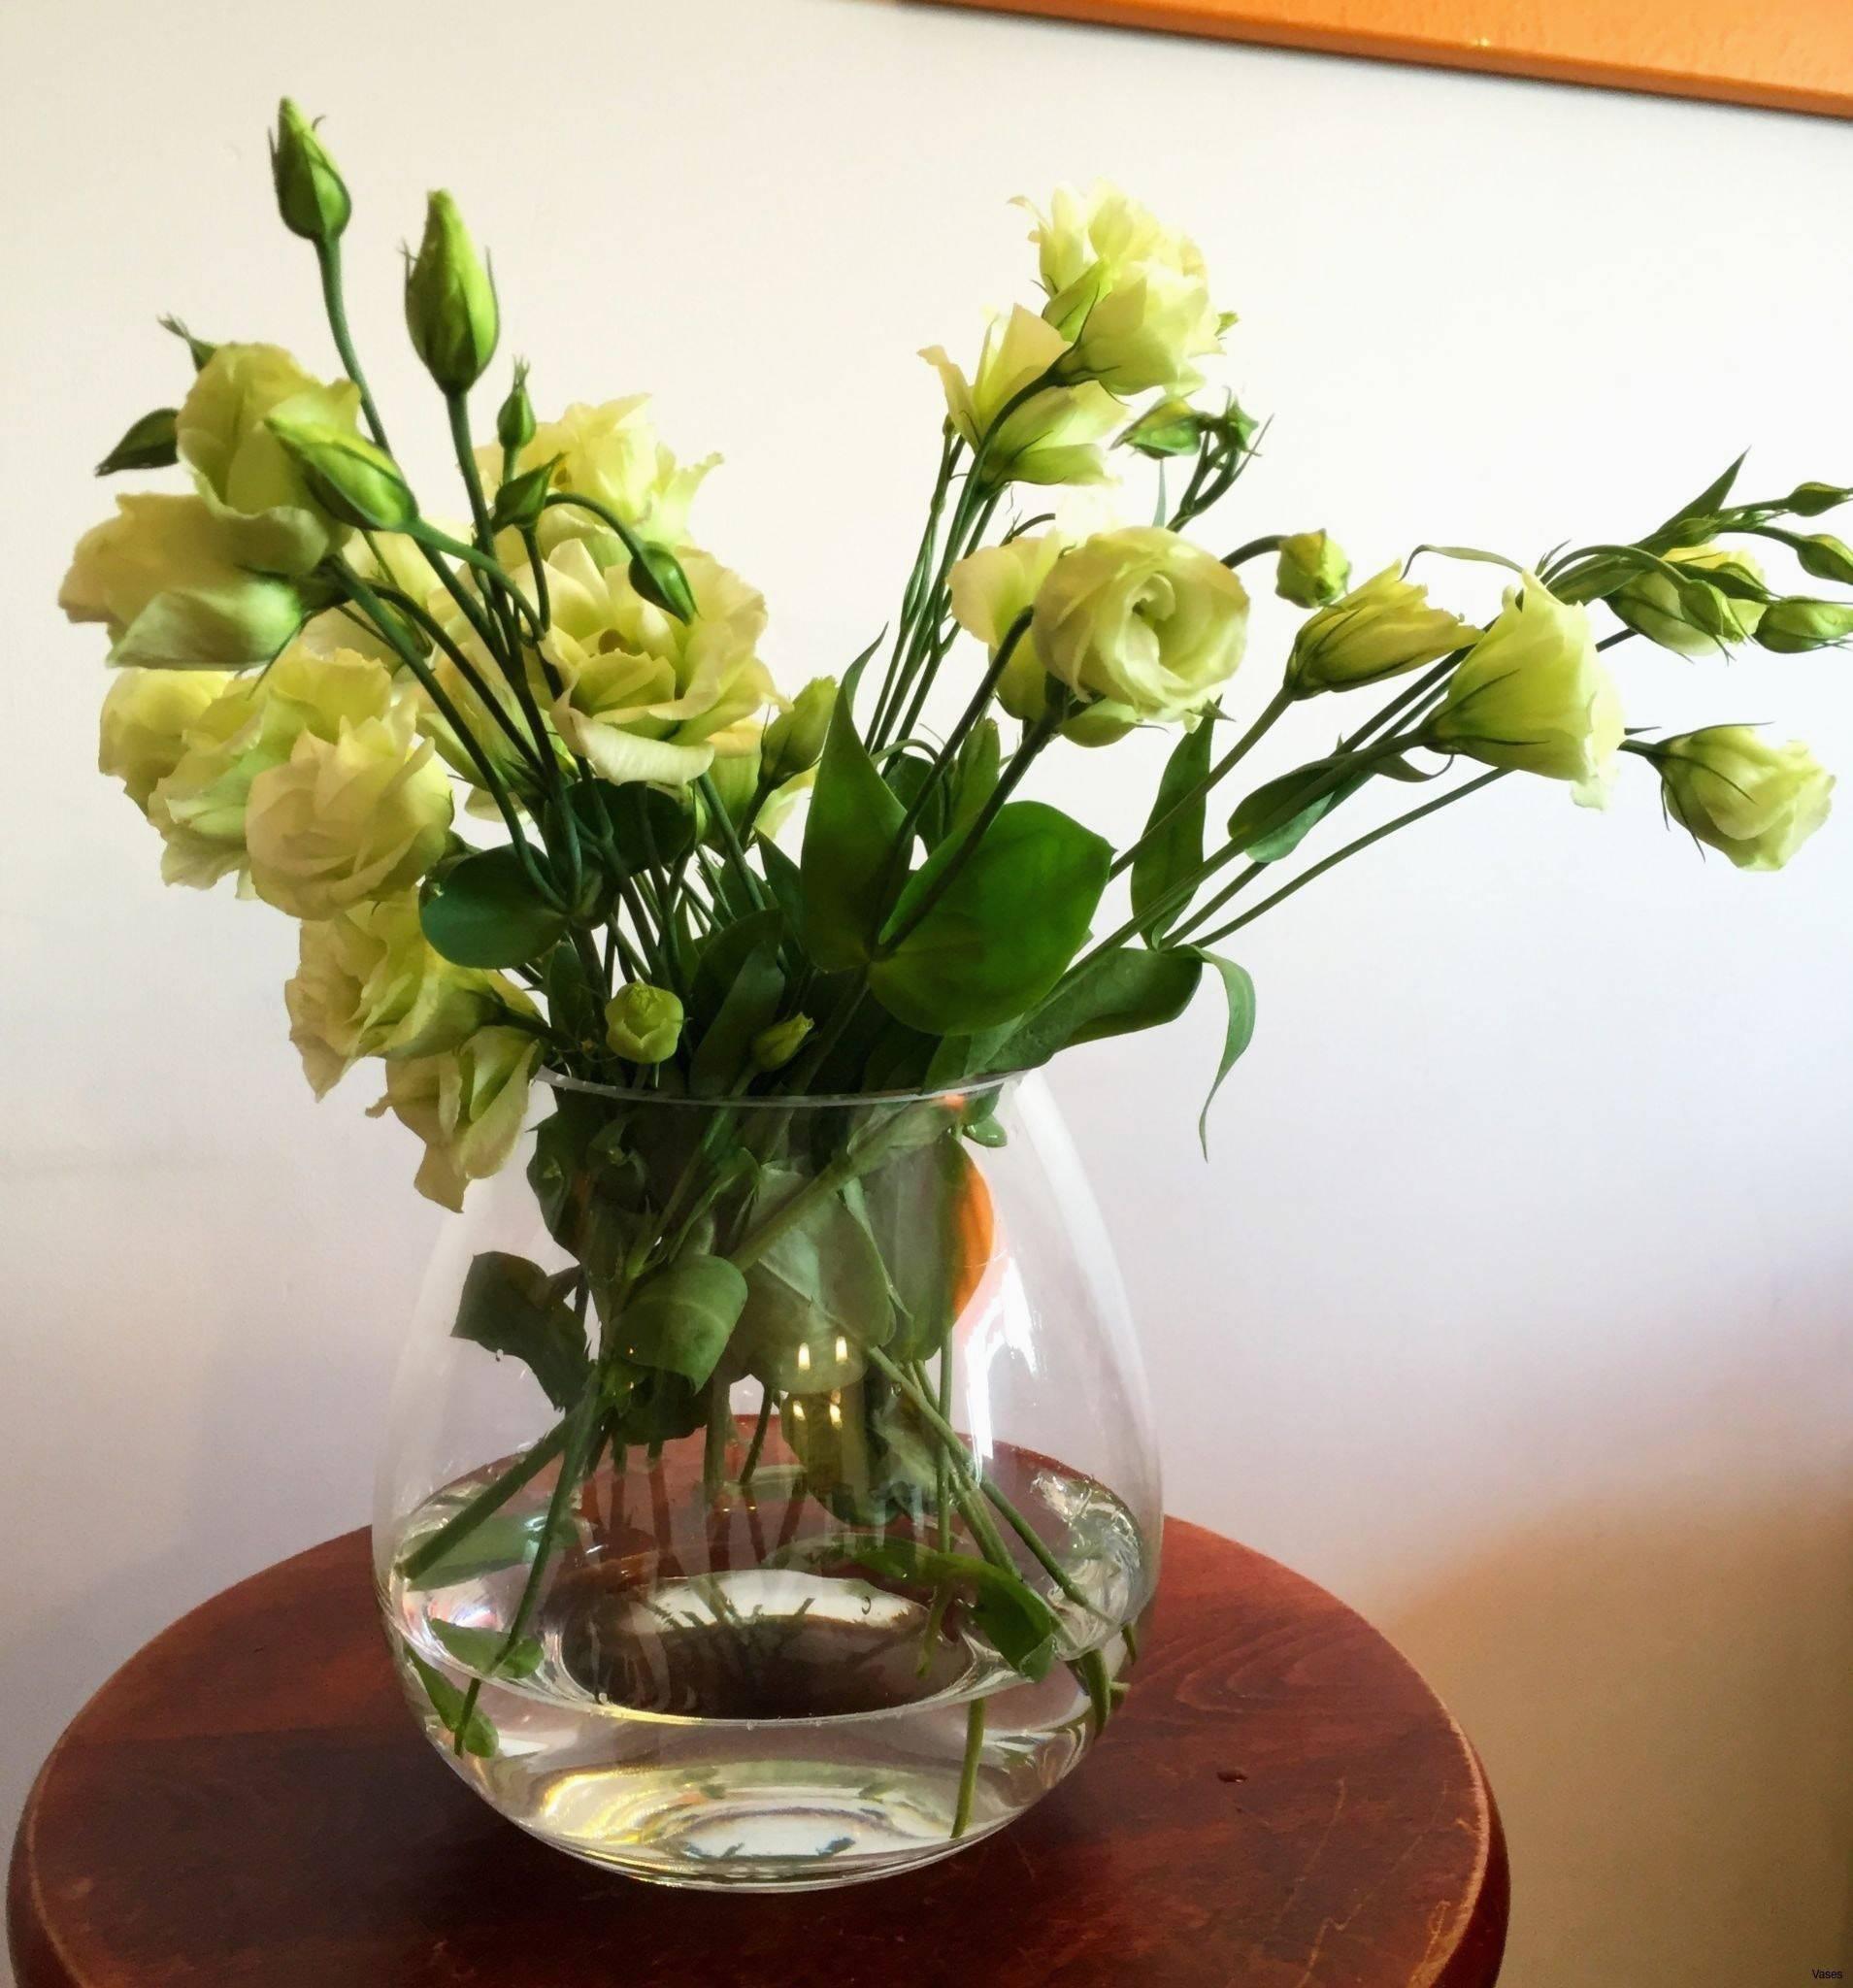 big vase flower arrangements of 27 various flower arrangement for dining table thunder for dining table centerpieces lovely flower vase table 04h vases tablei 0d clipart dining base end desi